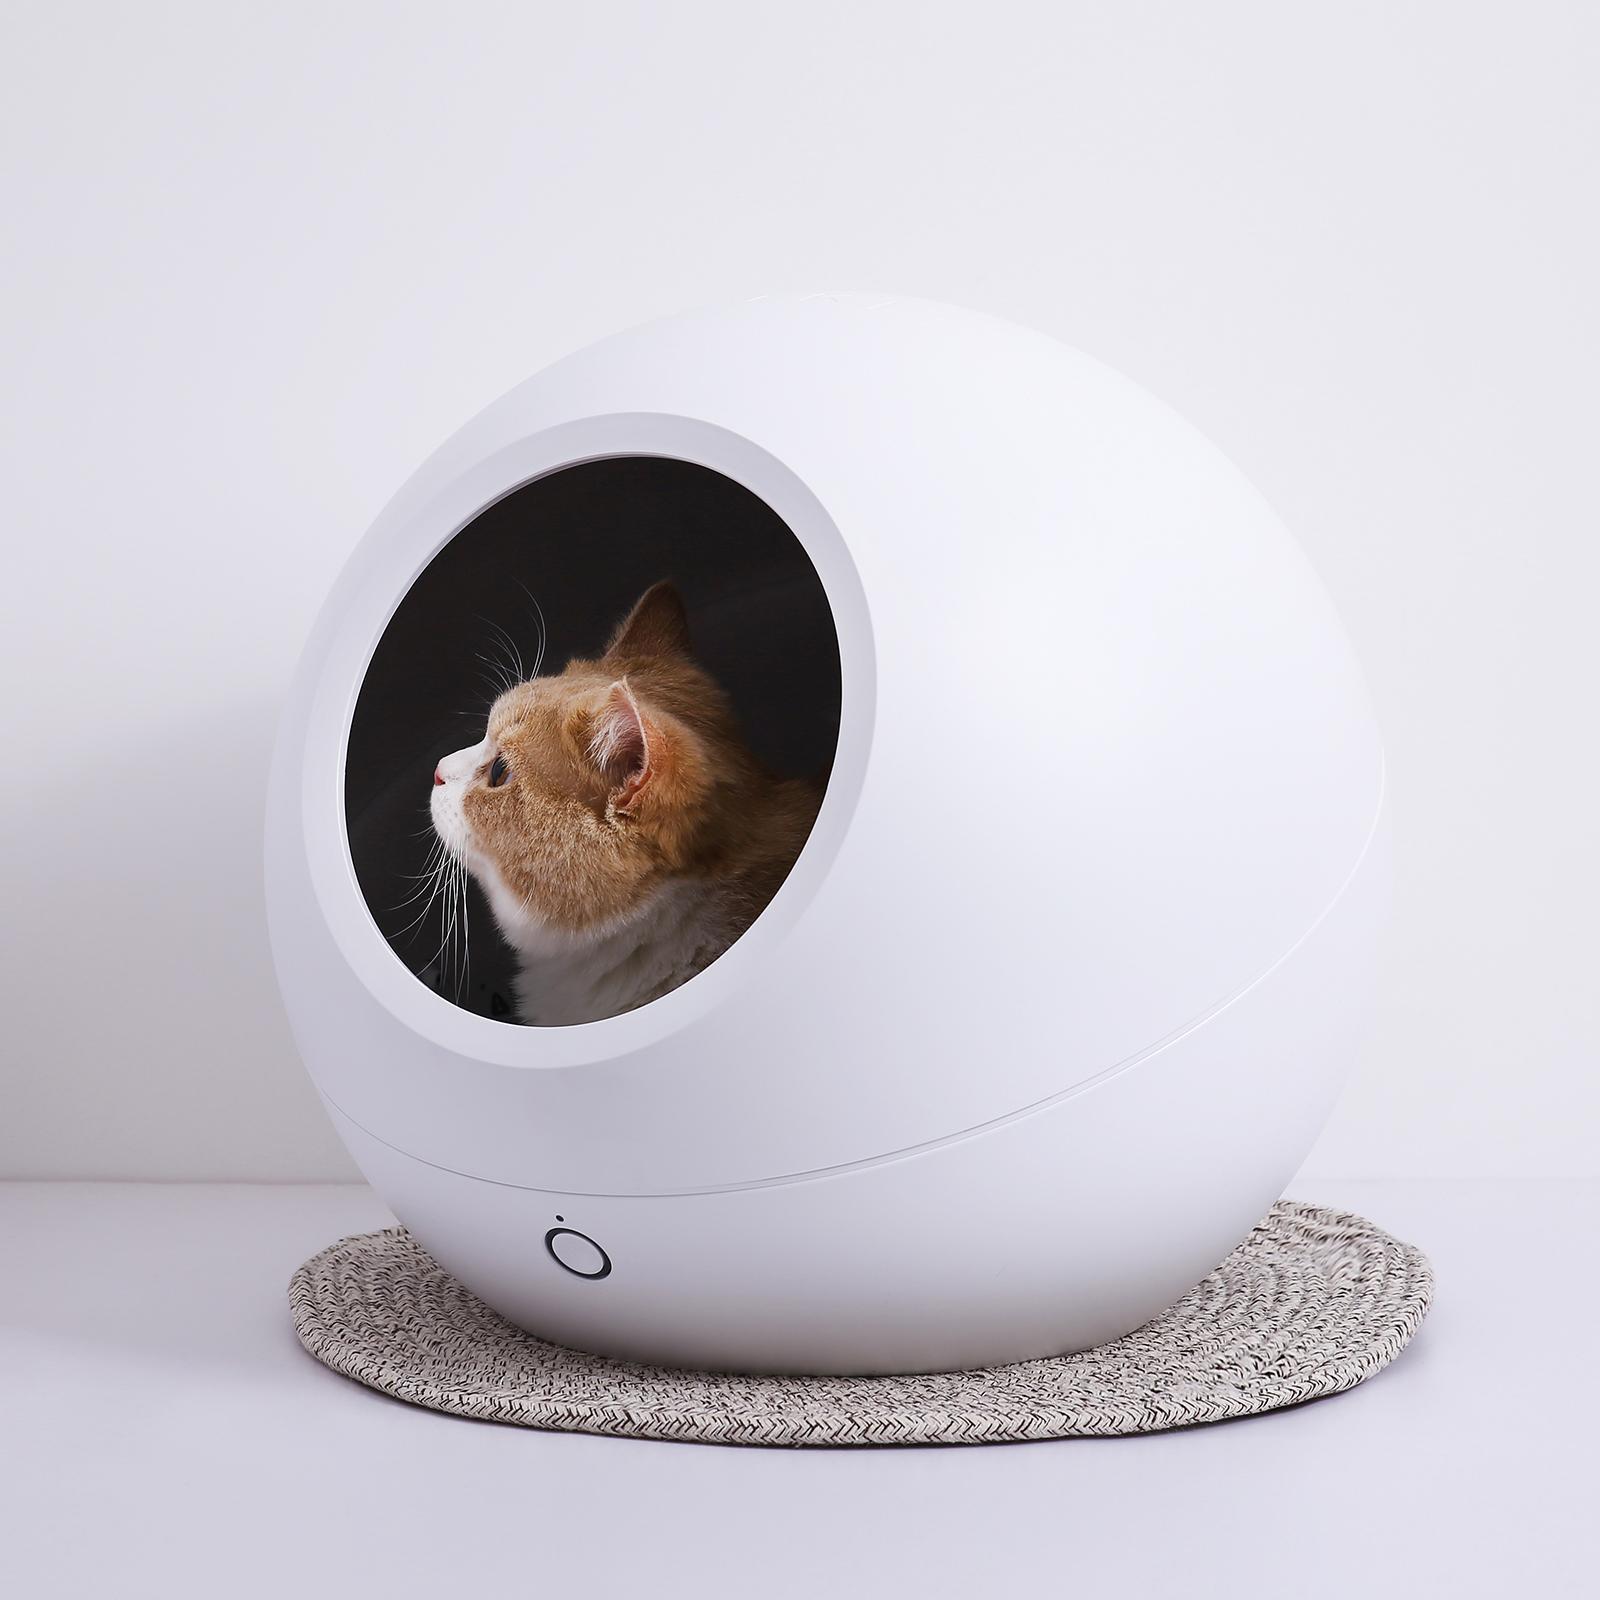 PETKIT Cozy Smart Pet House